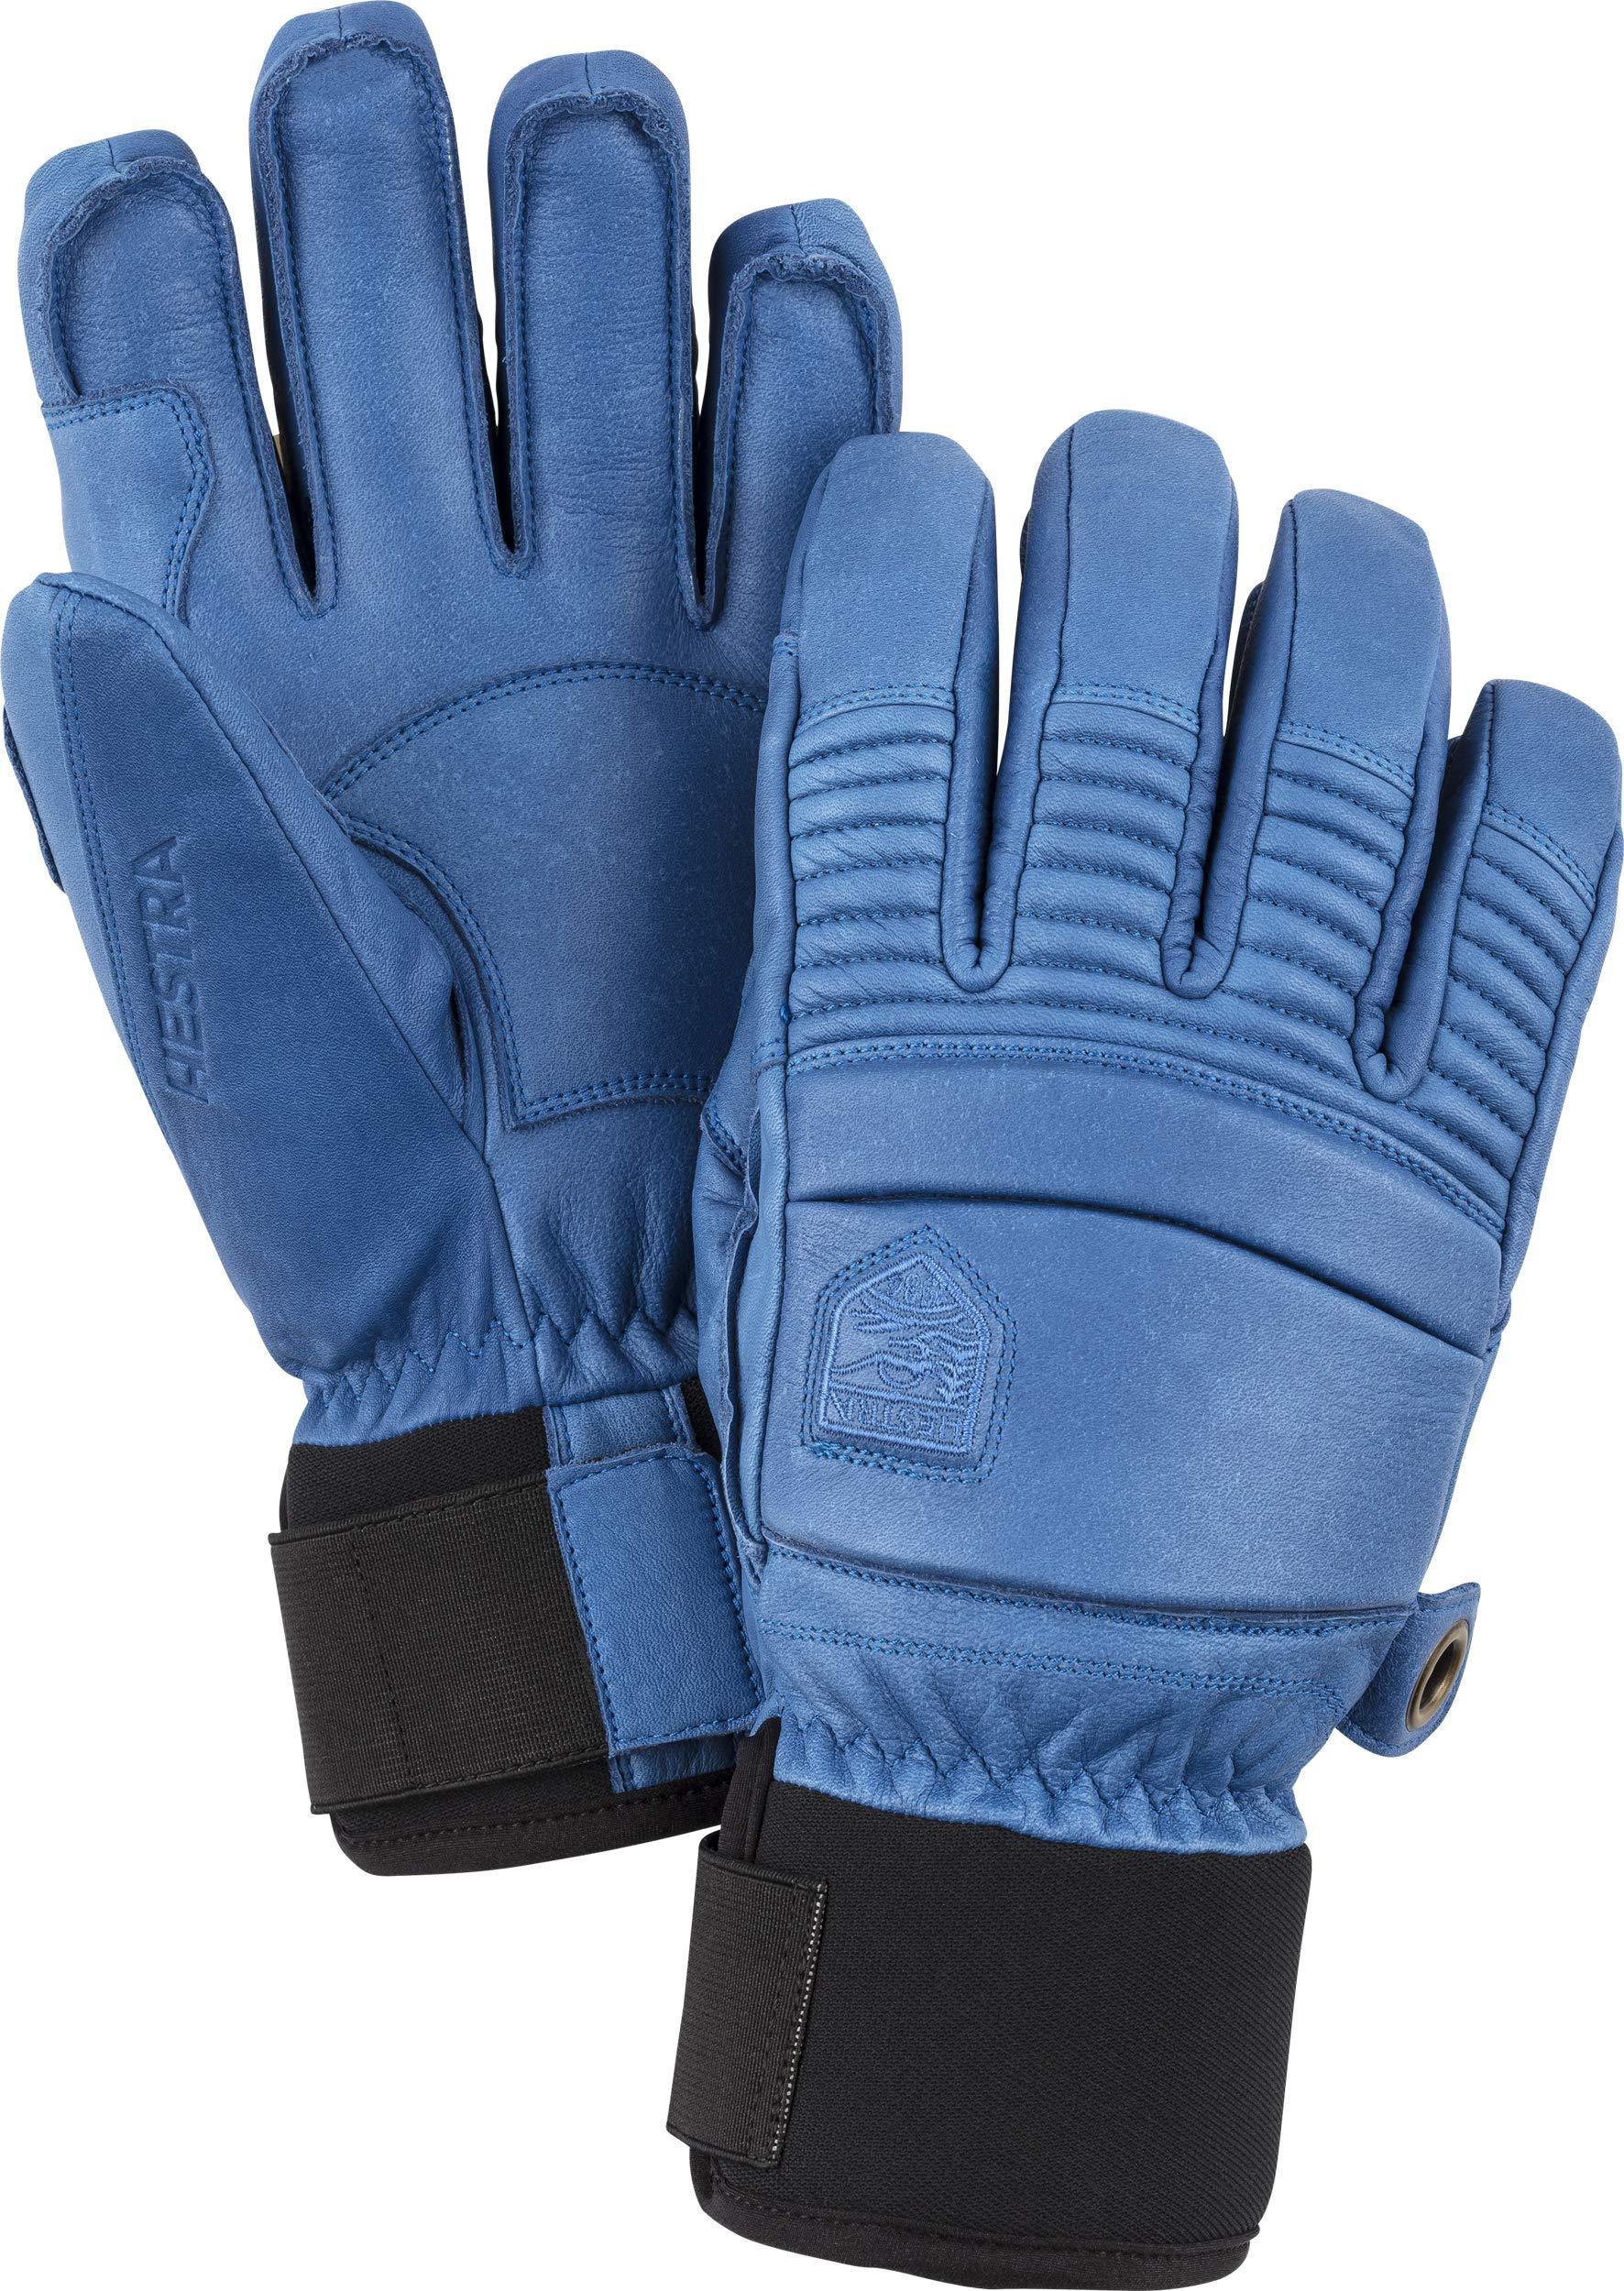 Hestra Men's Leather Fall Line 5 Finger Gloves - Royal Blue - 8 by Hestra